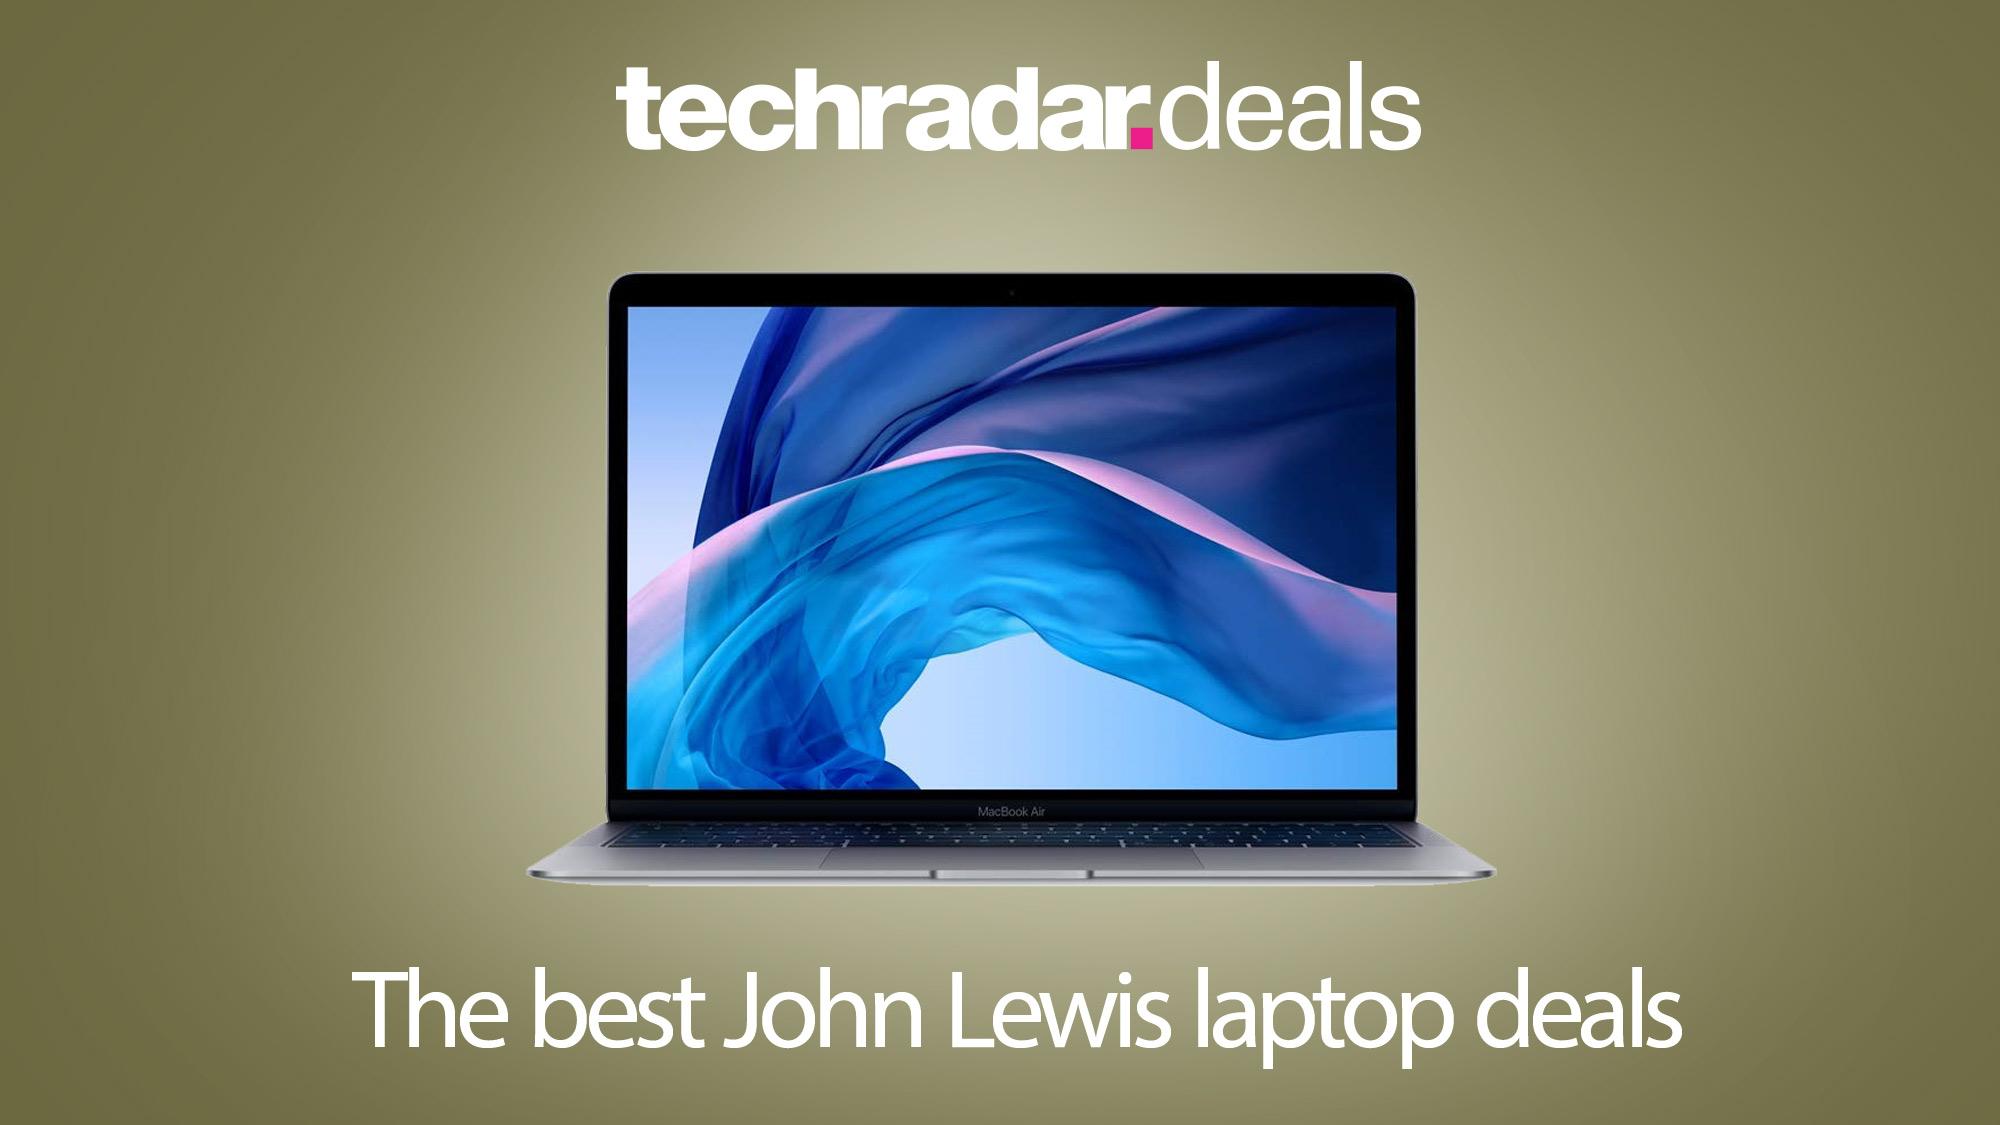 Fantastic John Lewis Black Friday Laptop Deals Come With A Unique Reason To Buy Techradar